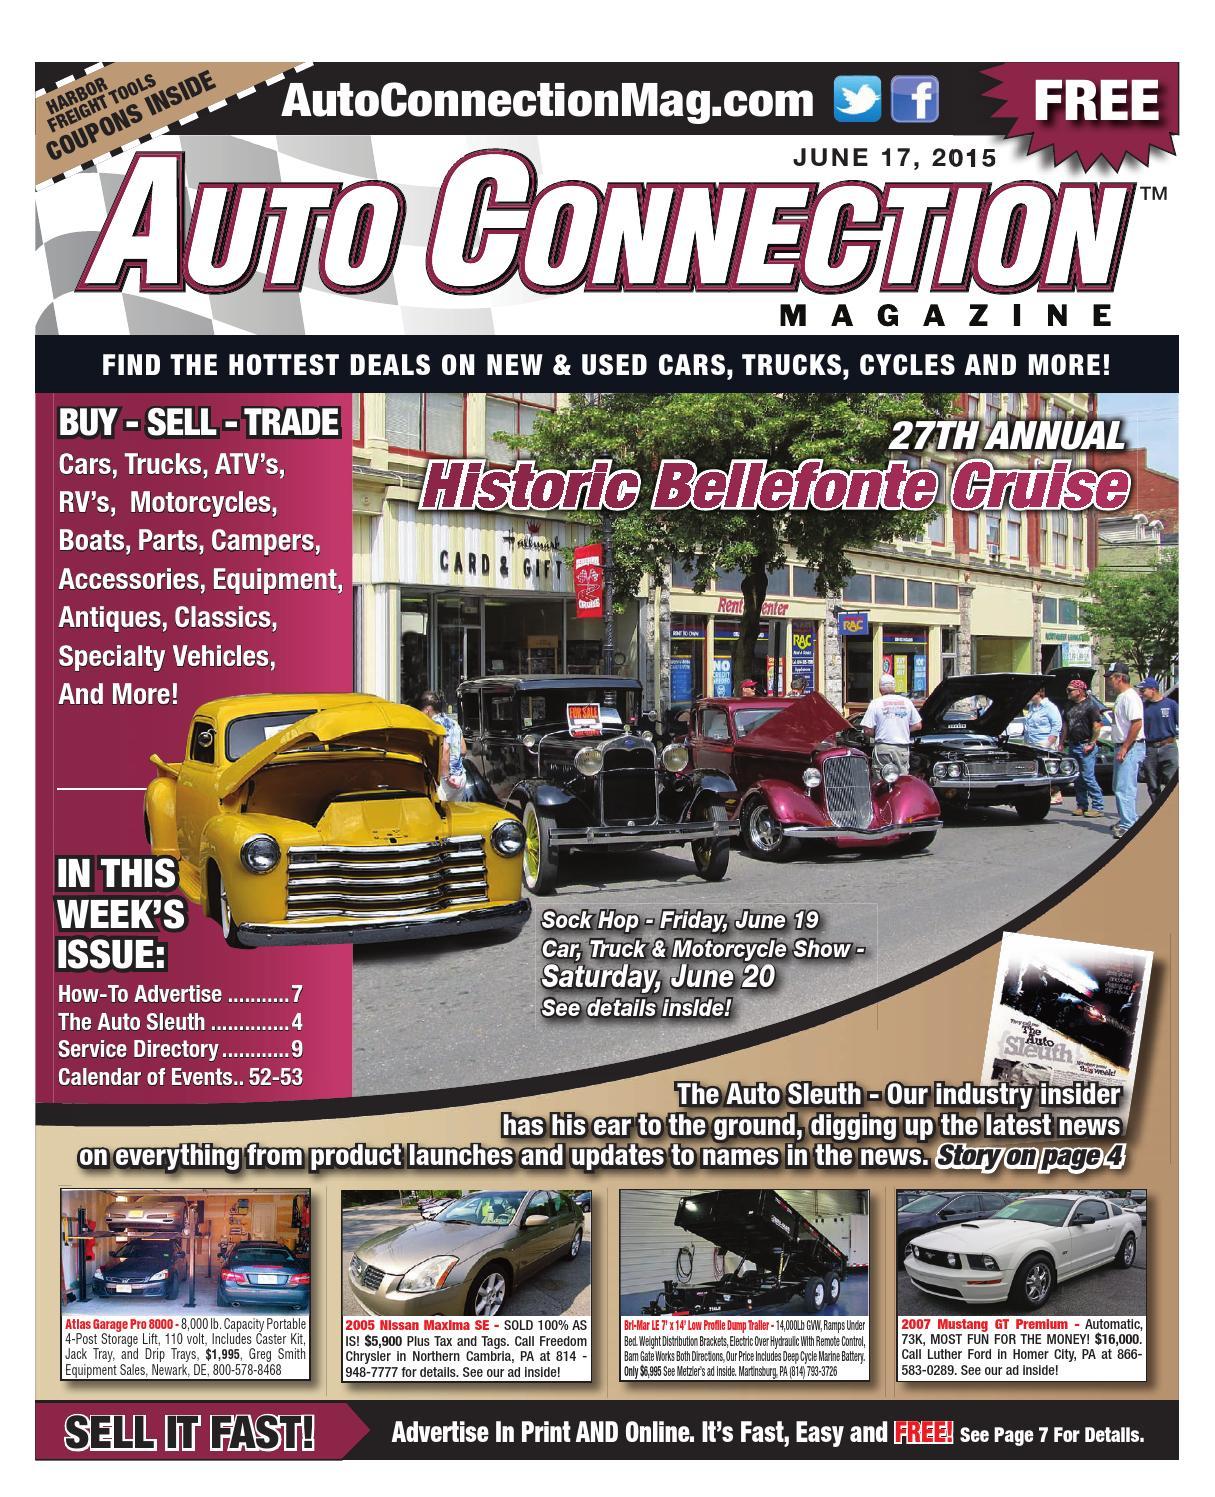 Radiator Performance Radiator 622 fits 88-00 Chevy GMC Pickups 5.7L